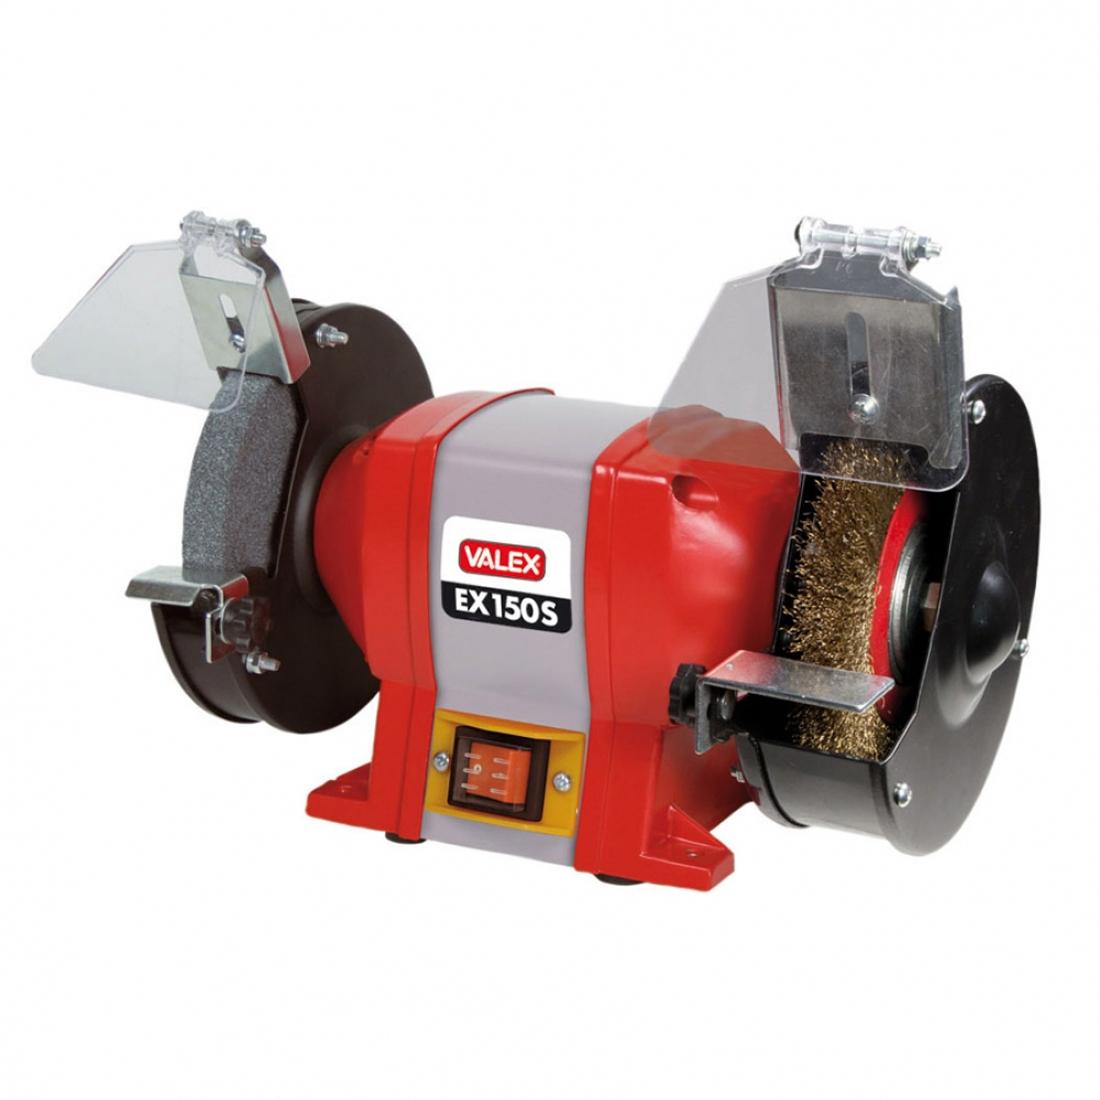 Valex EX150S Bench Grinding Wheel